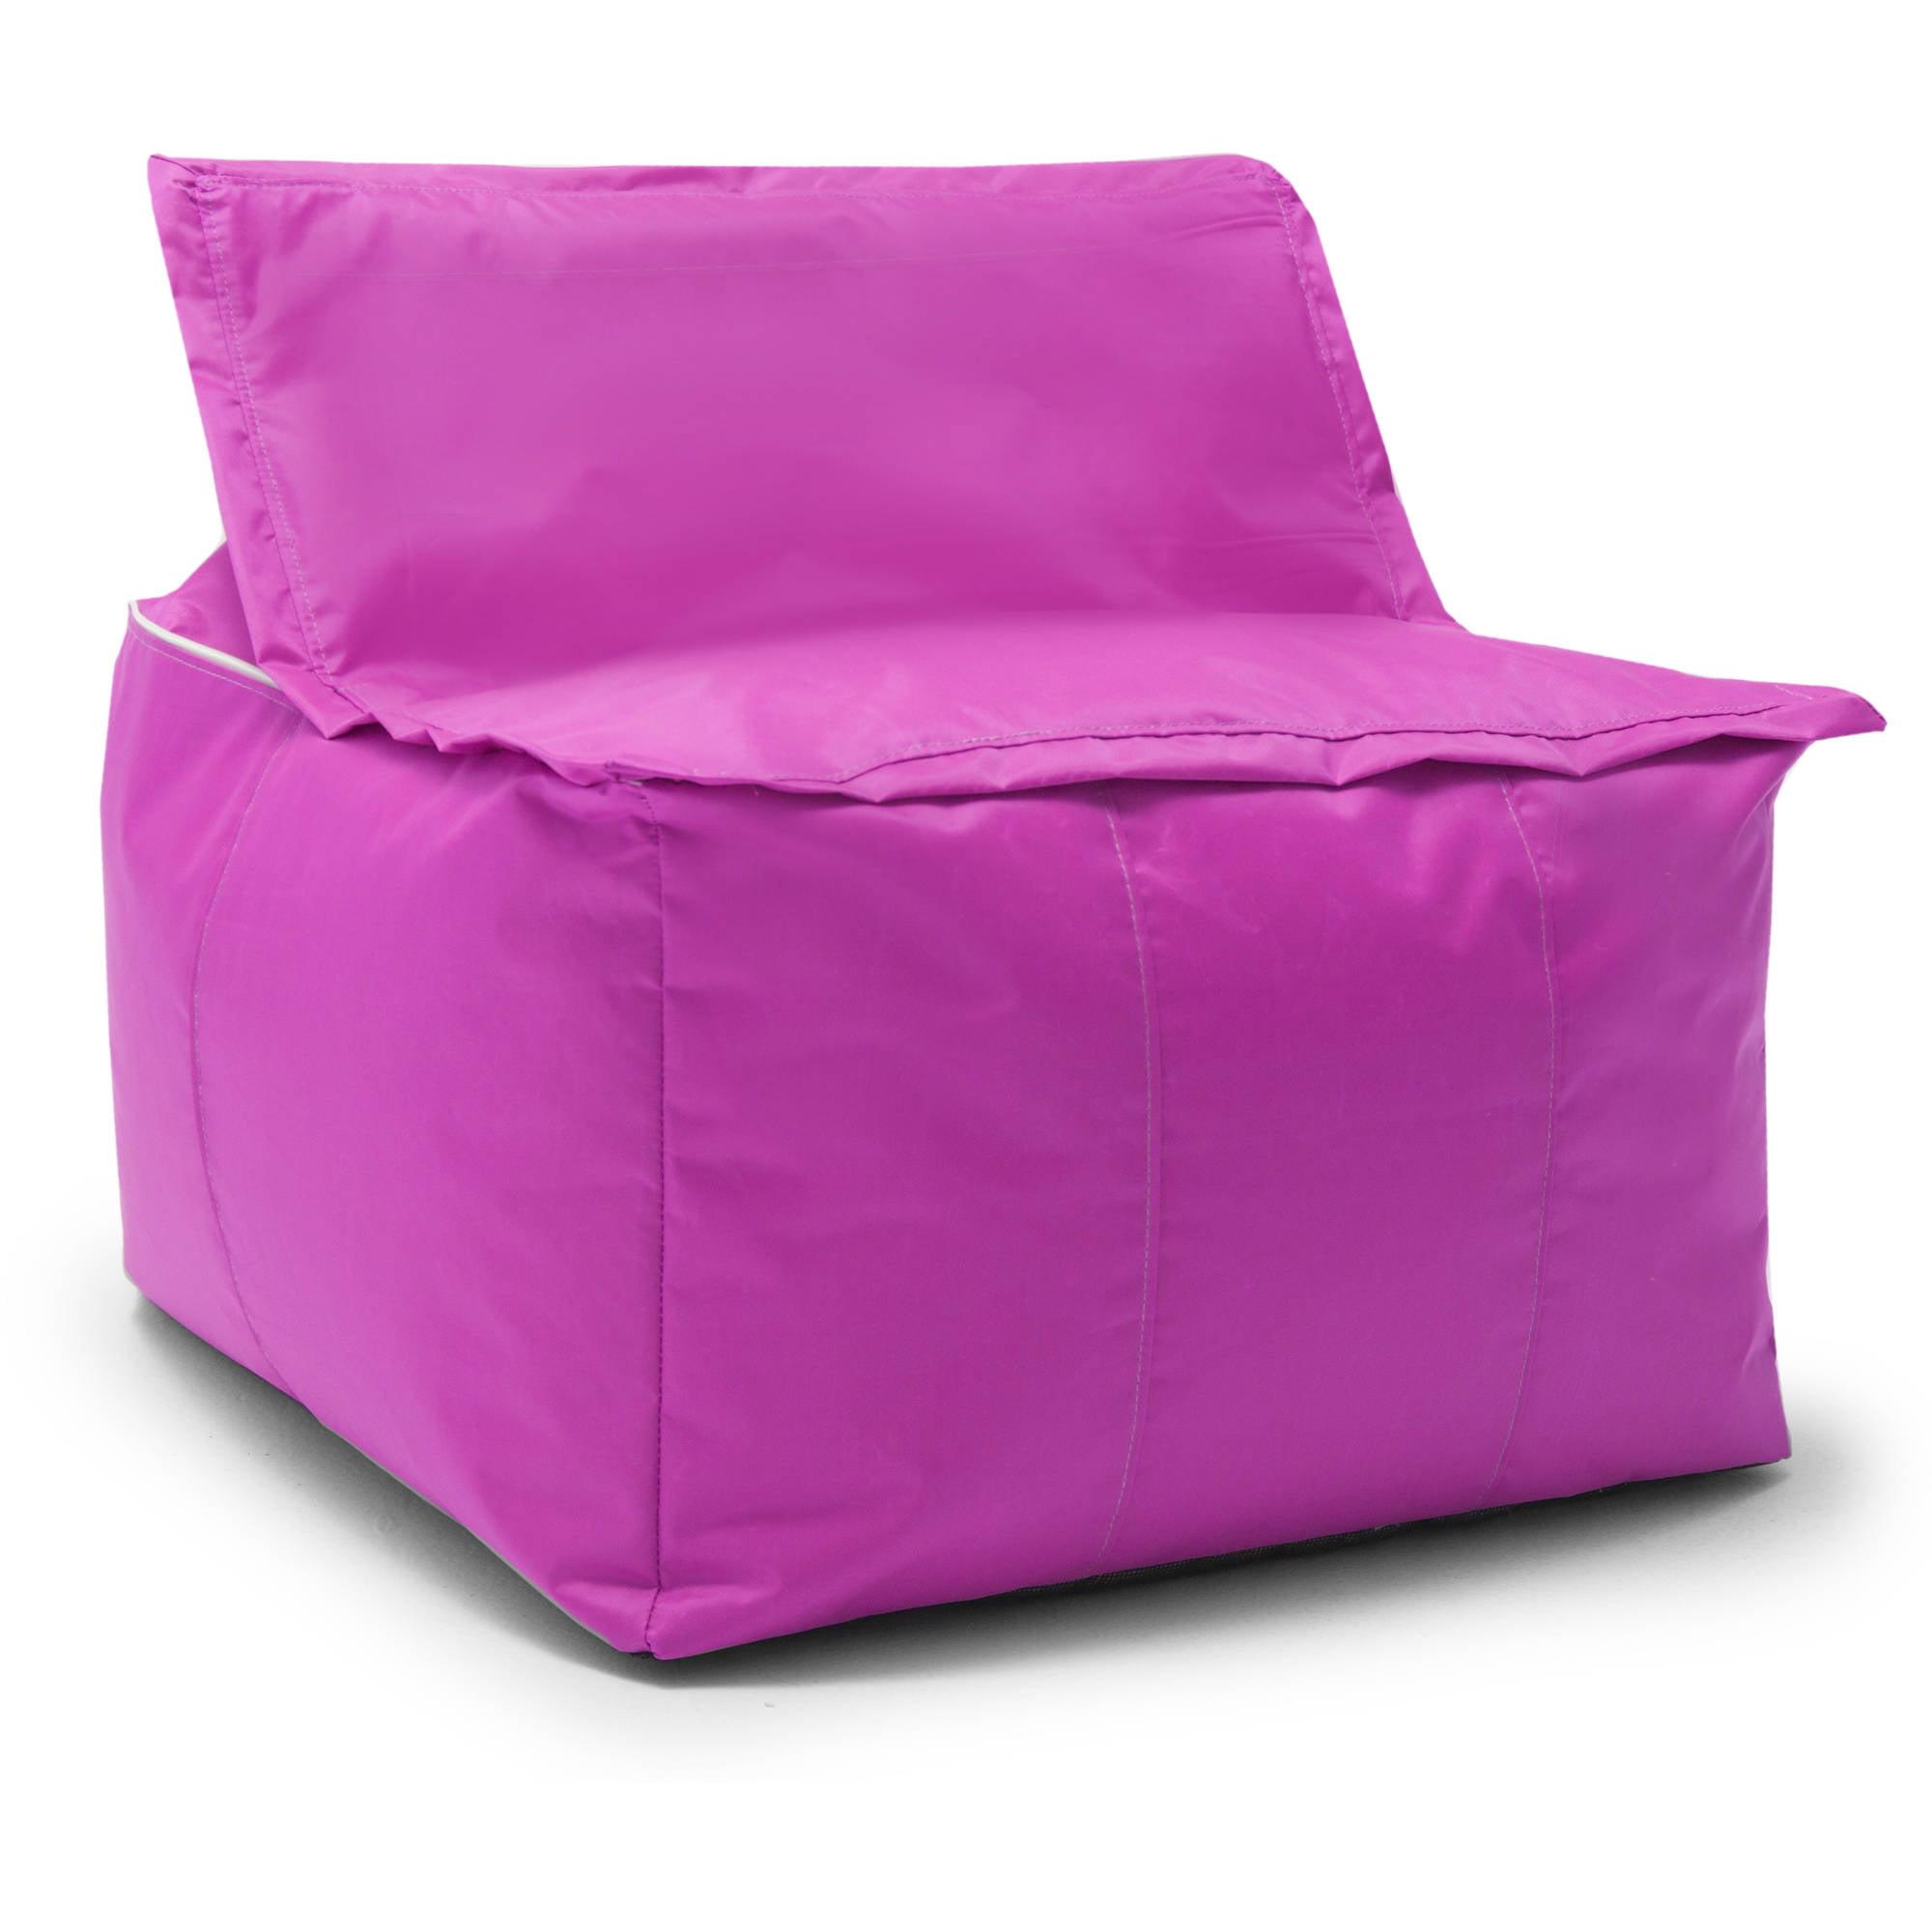 Admirable Unbranded Big Joe Zip Ottoman Fuchsia Supreme Andrewgaddart Wooden Chair Designs For Living Room Andrewgaddartcom